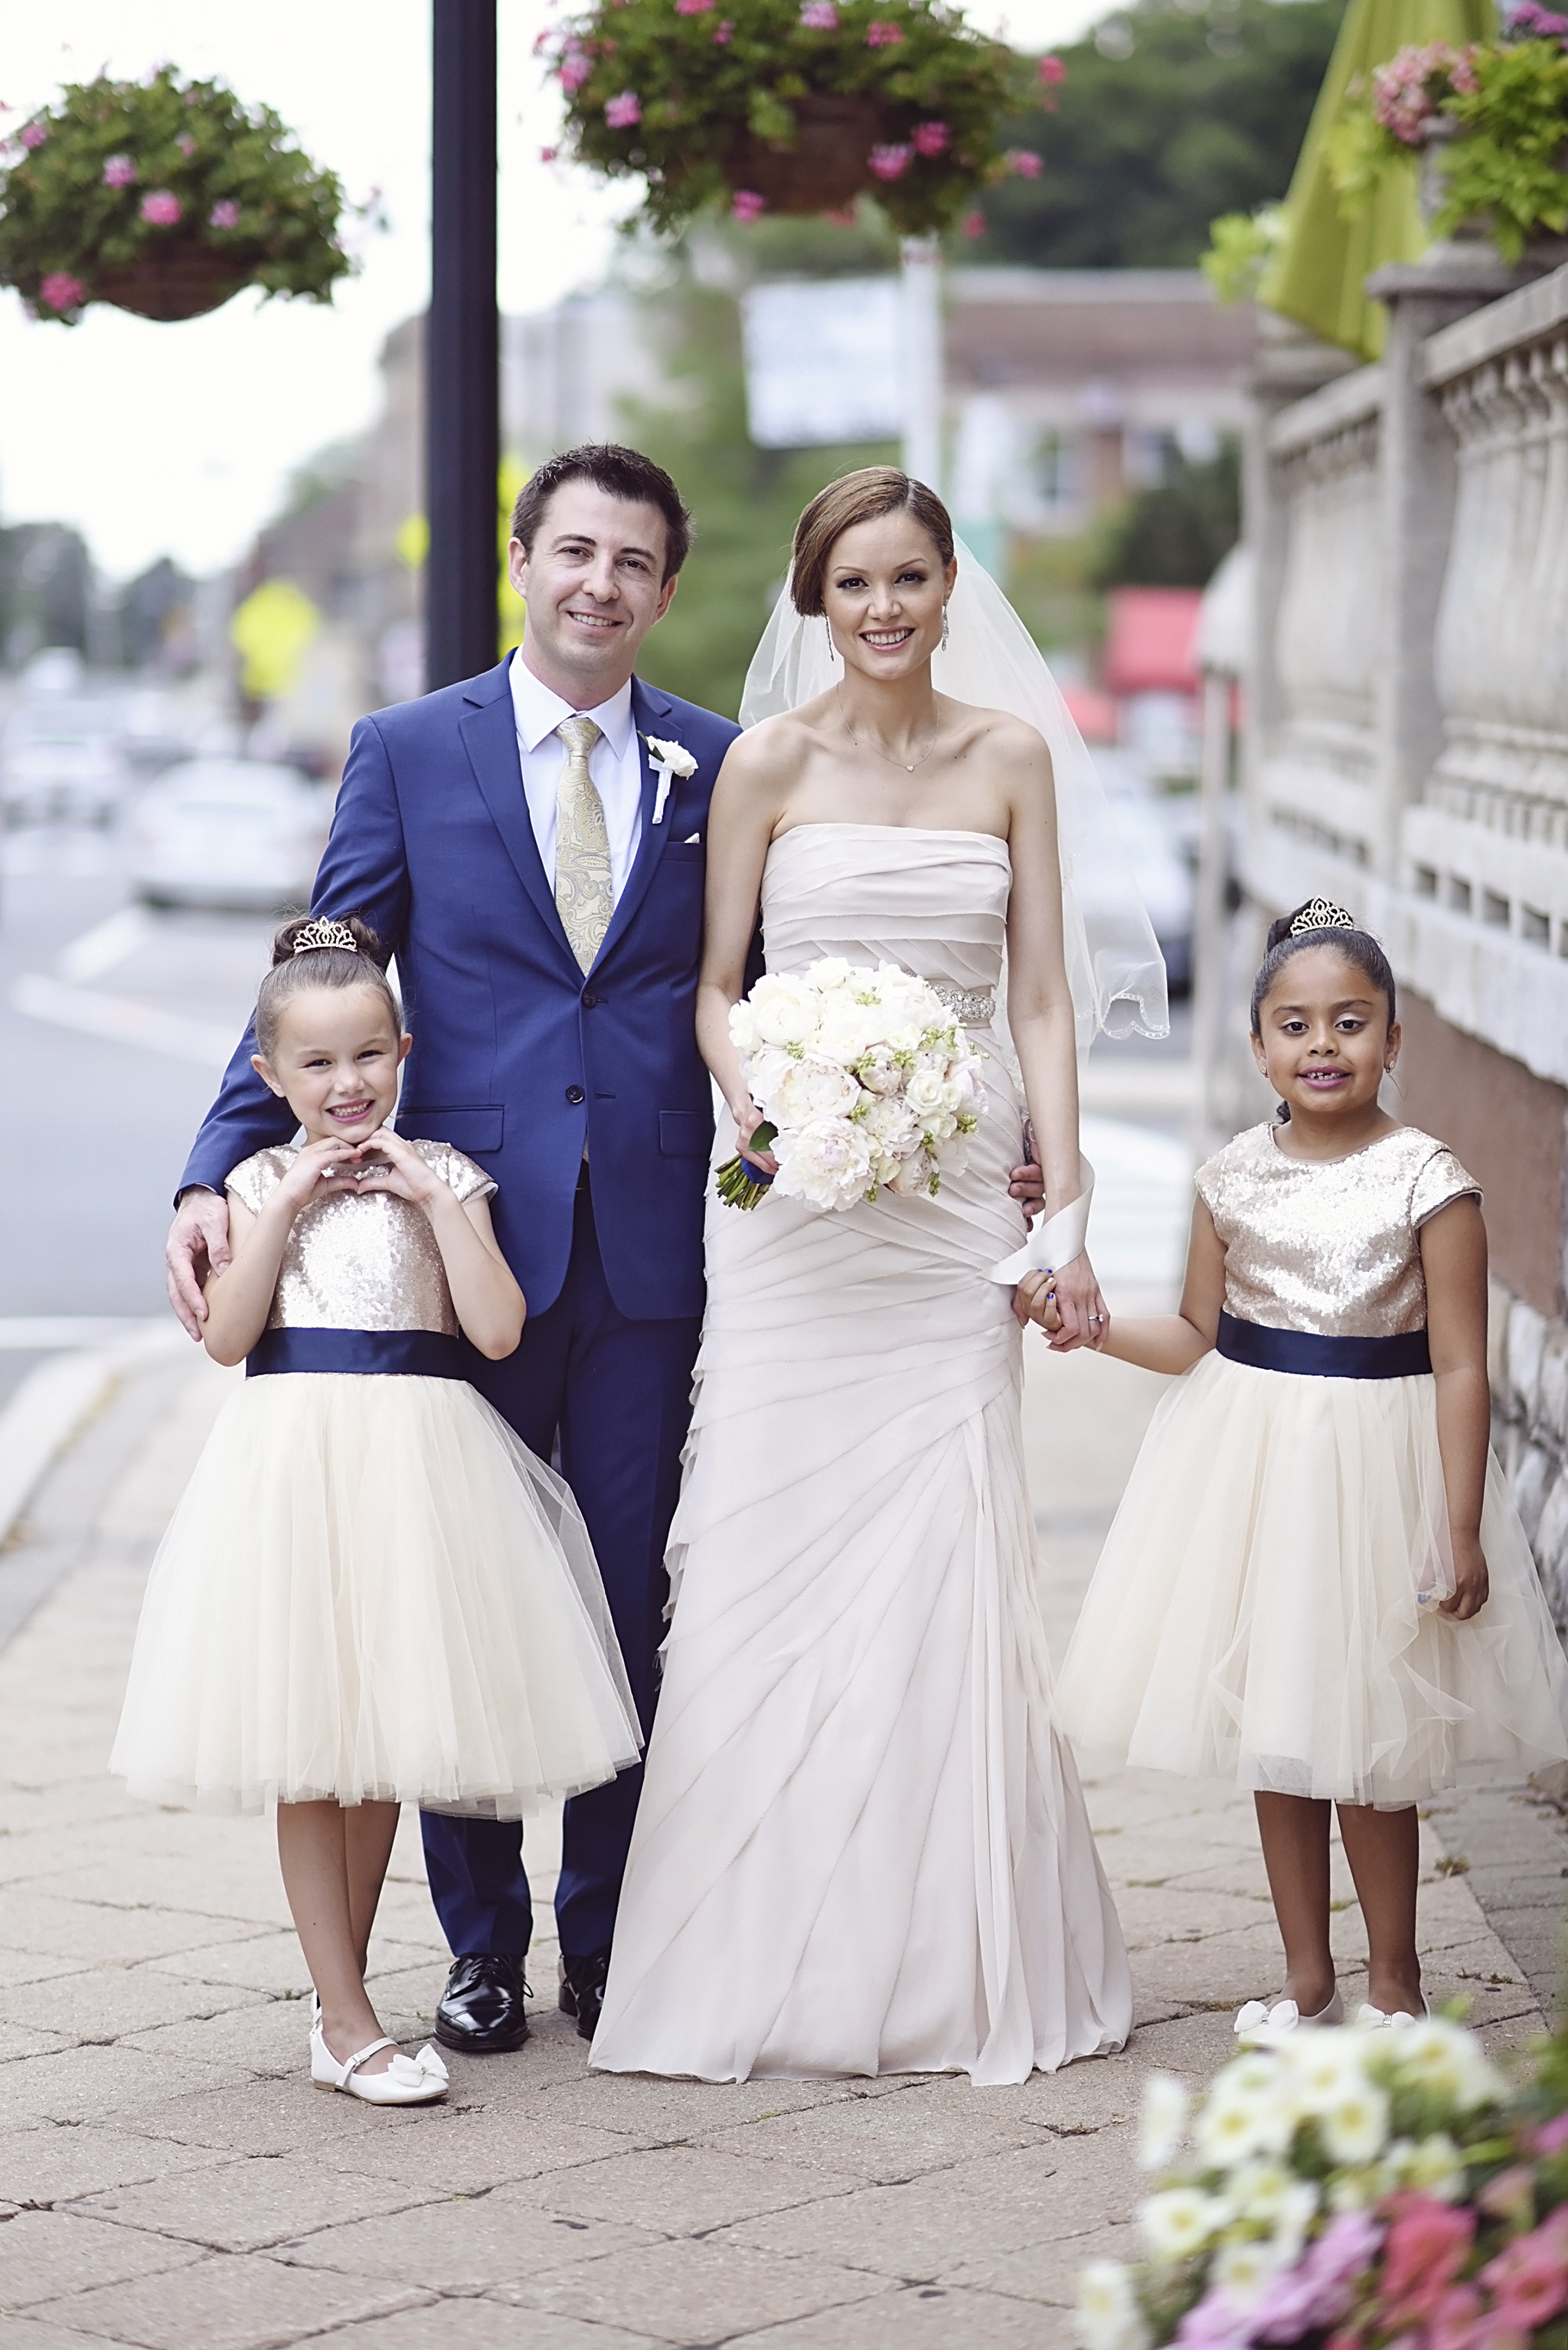 NJ-NY-wedding-photographer-004NJ-NY-wedding-photographer-004NJ-NY-WEDDING-PHOTOGRAPHER-004.JPG